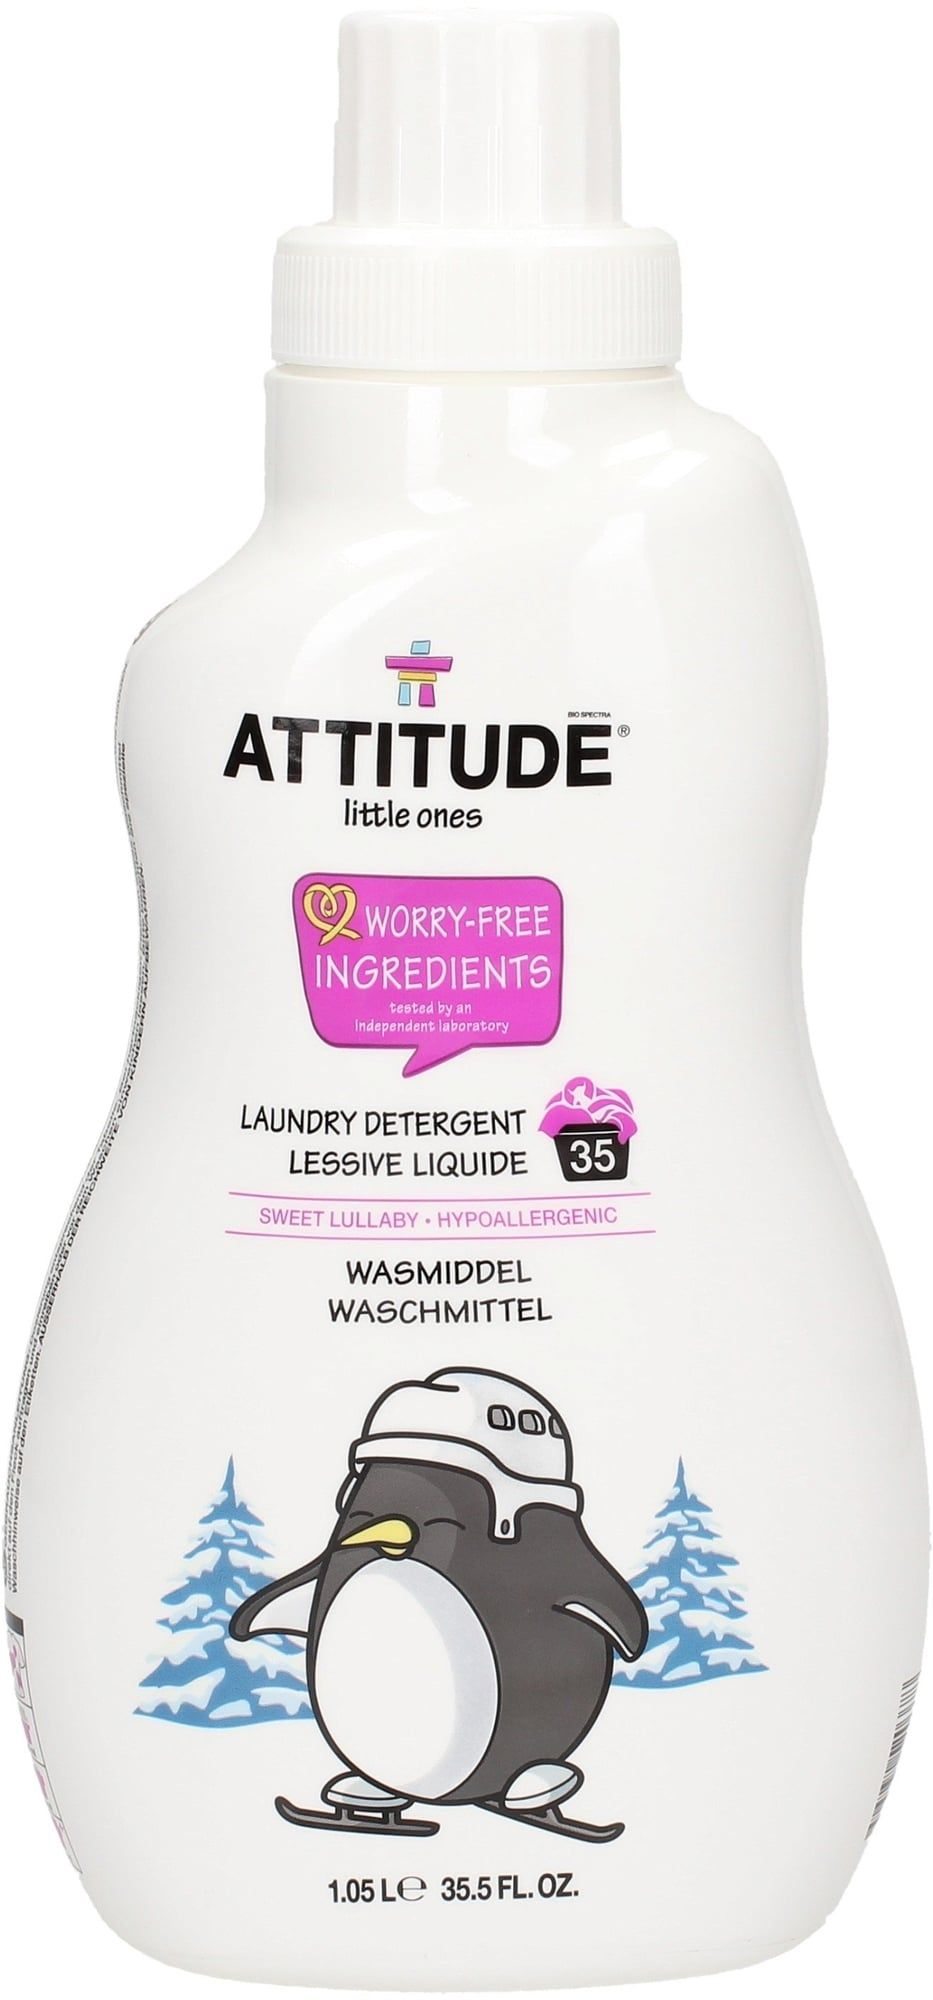 Lessive liquide Sweet Lullaby ATTITUDE